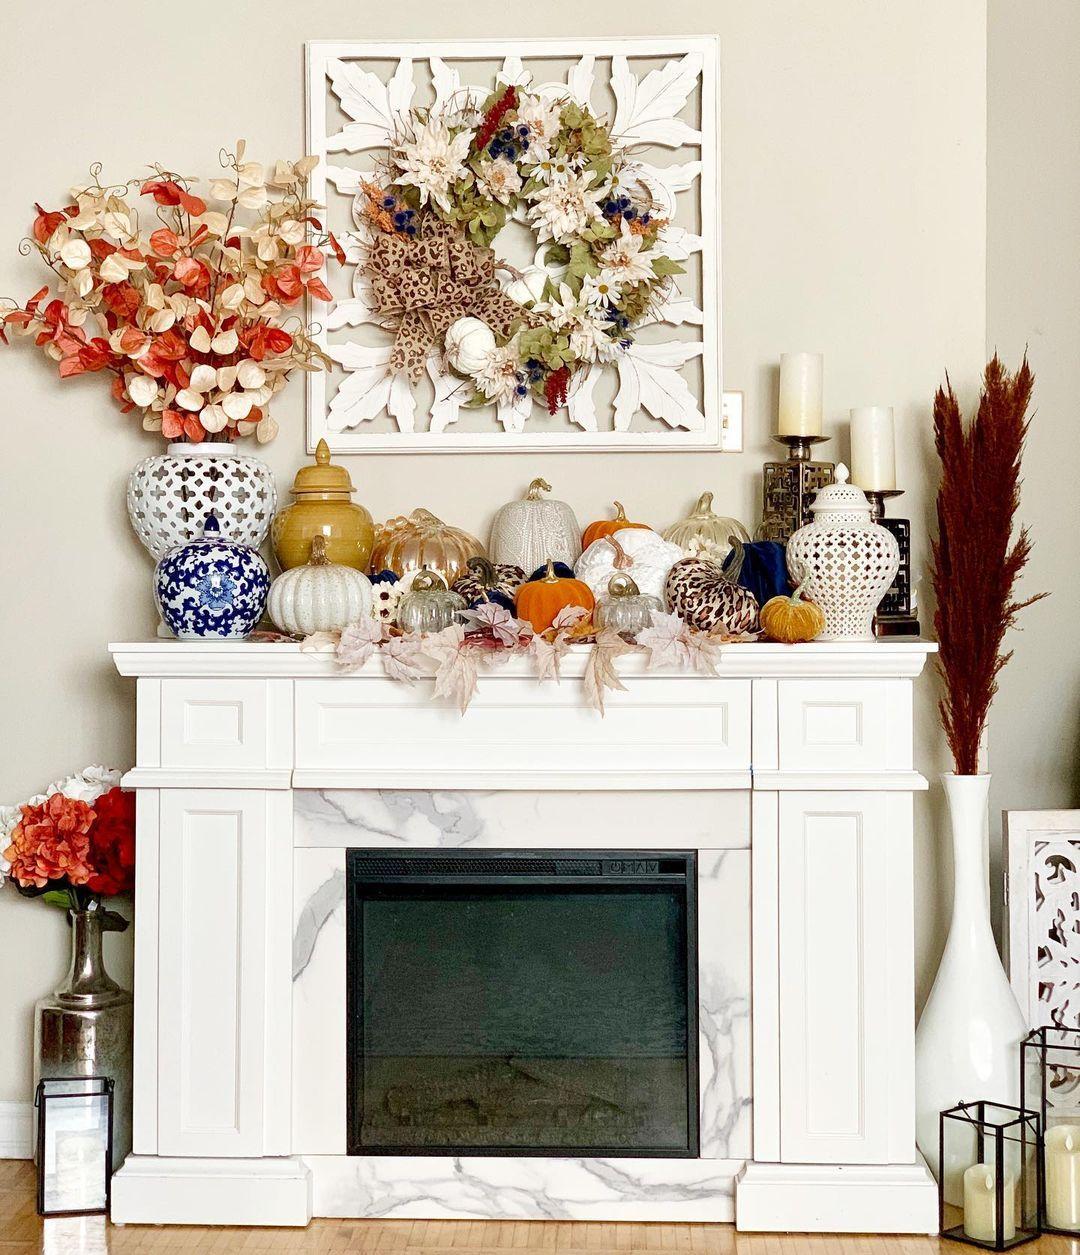 "🤍Christina Marie🤍 on Instagram: ""More fall decor in the house #hellofall #falldecor #lovetodecorate #fallvibes #falliscoming #fall2020 #fallcolors #leopardprint #pumpkins…"""